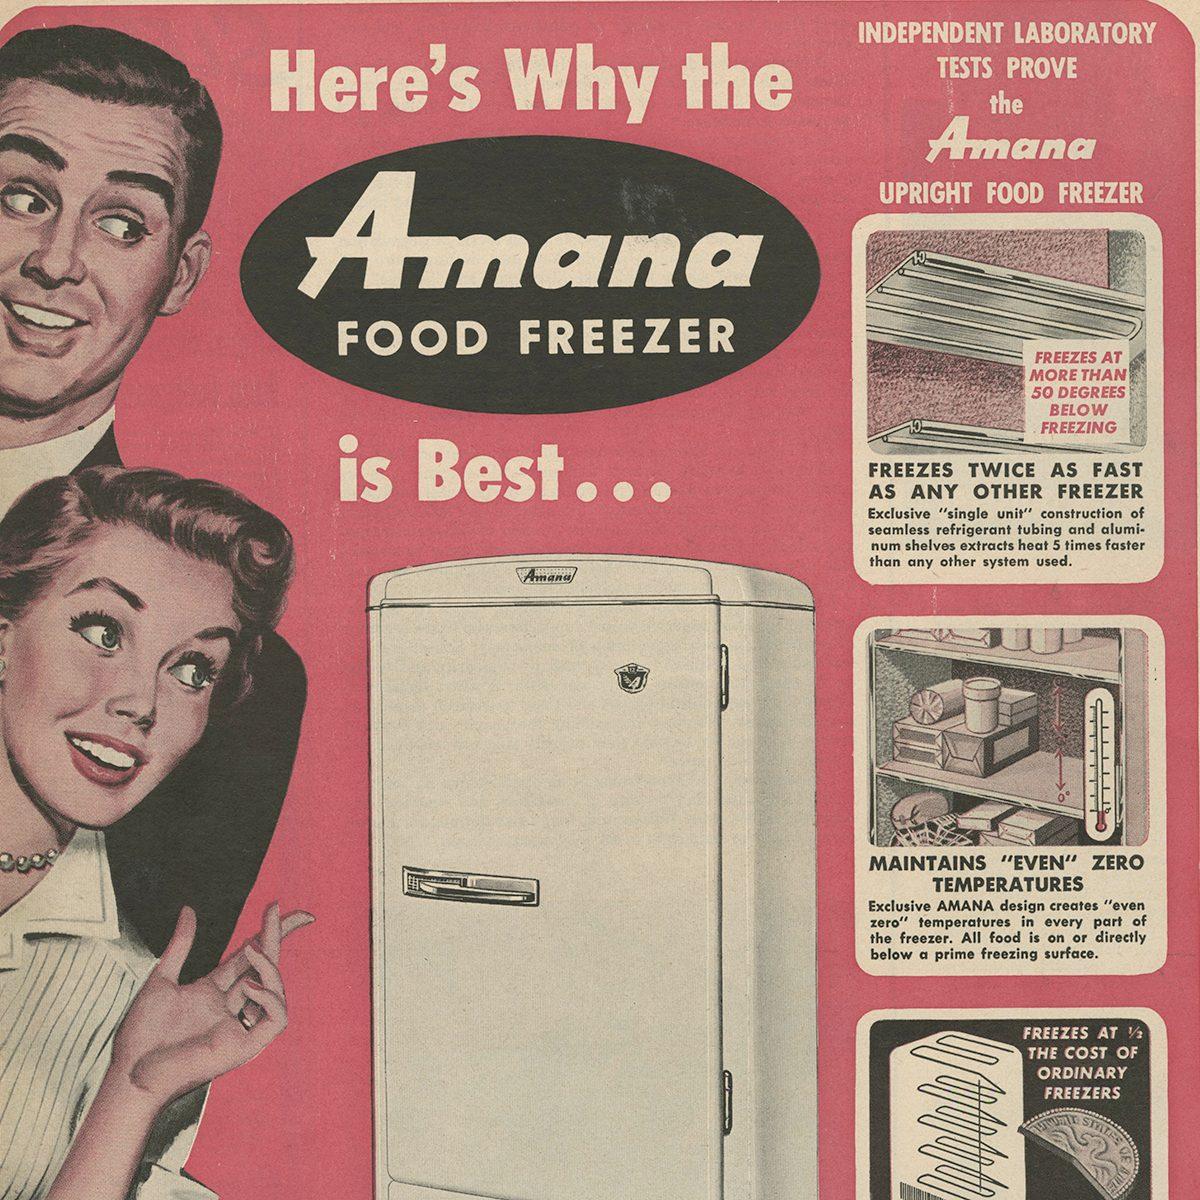 Amana Food Freezer ad